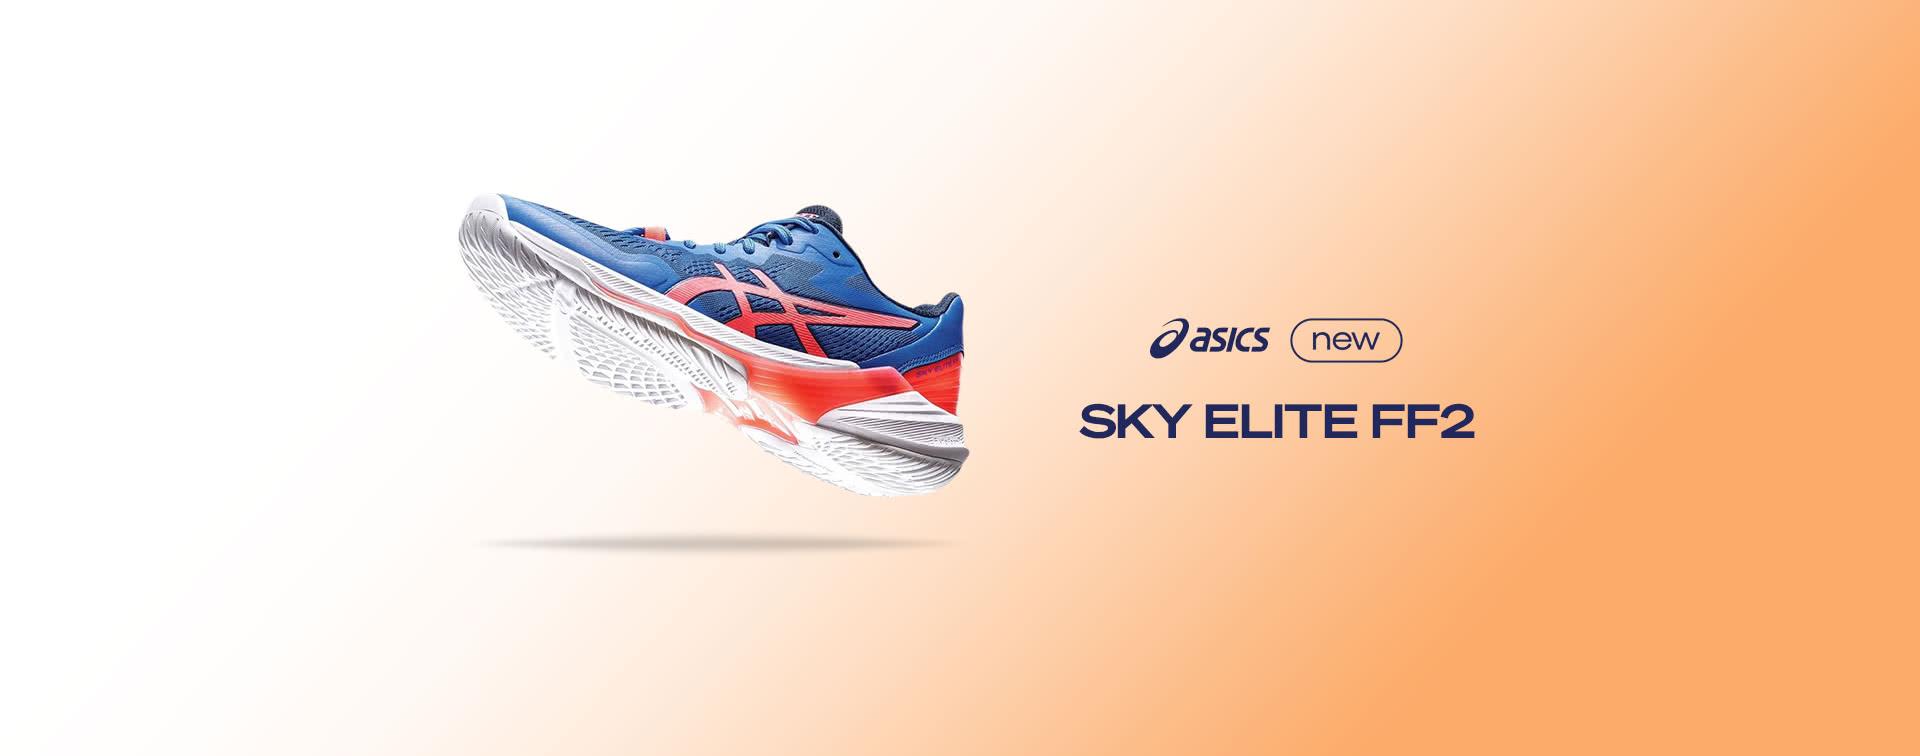 Chaussures de volleyball Asics Gel Sky Elite